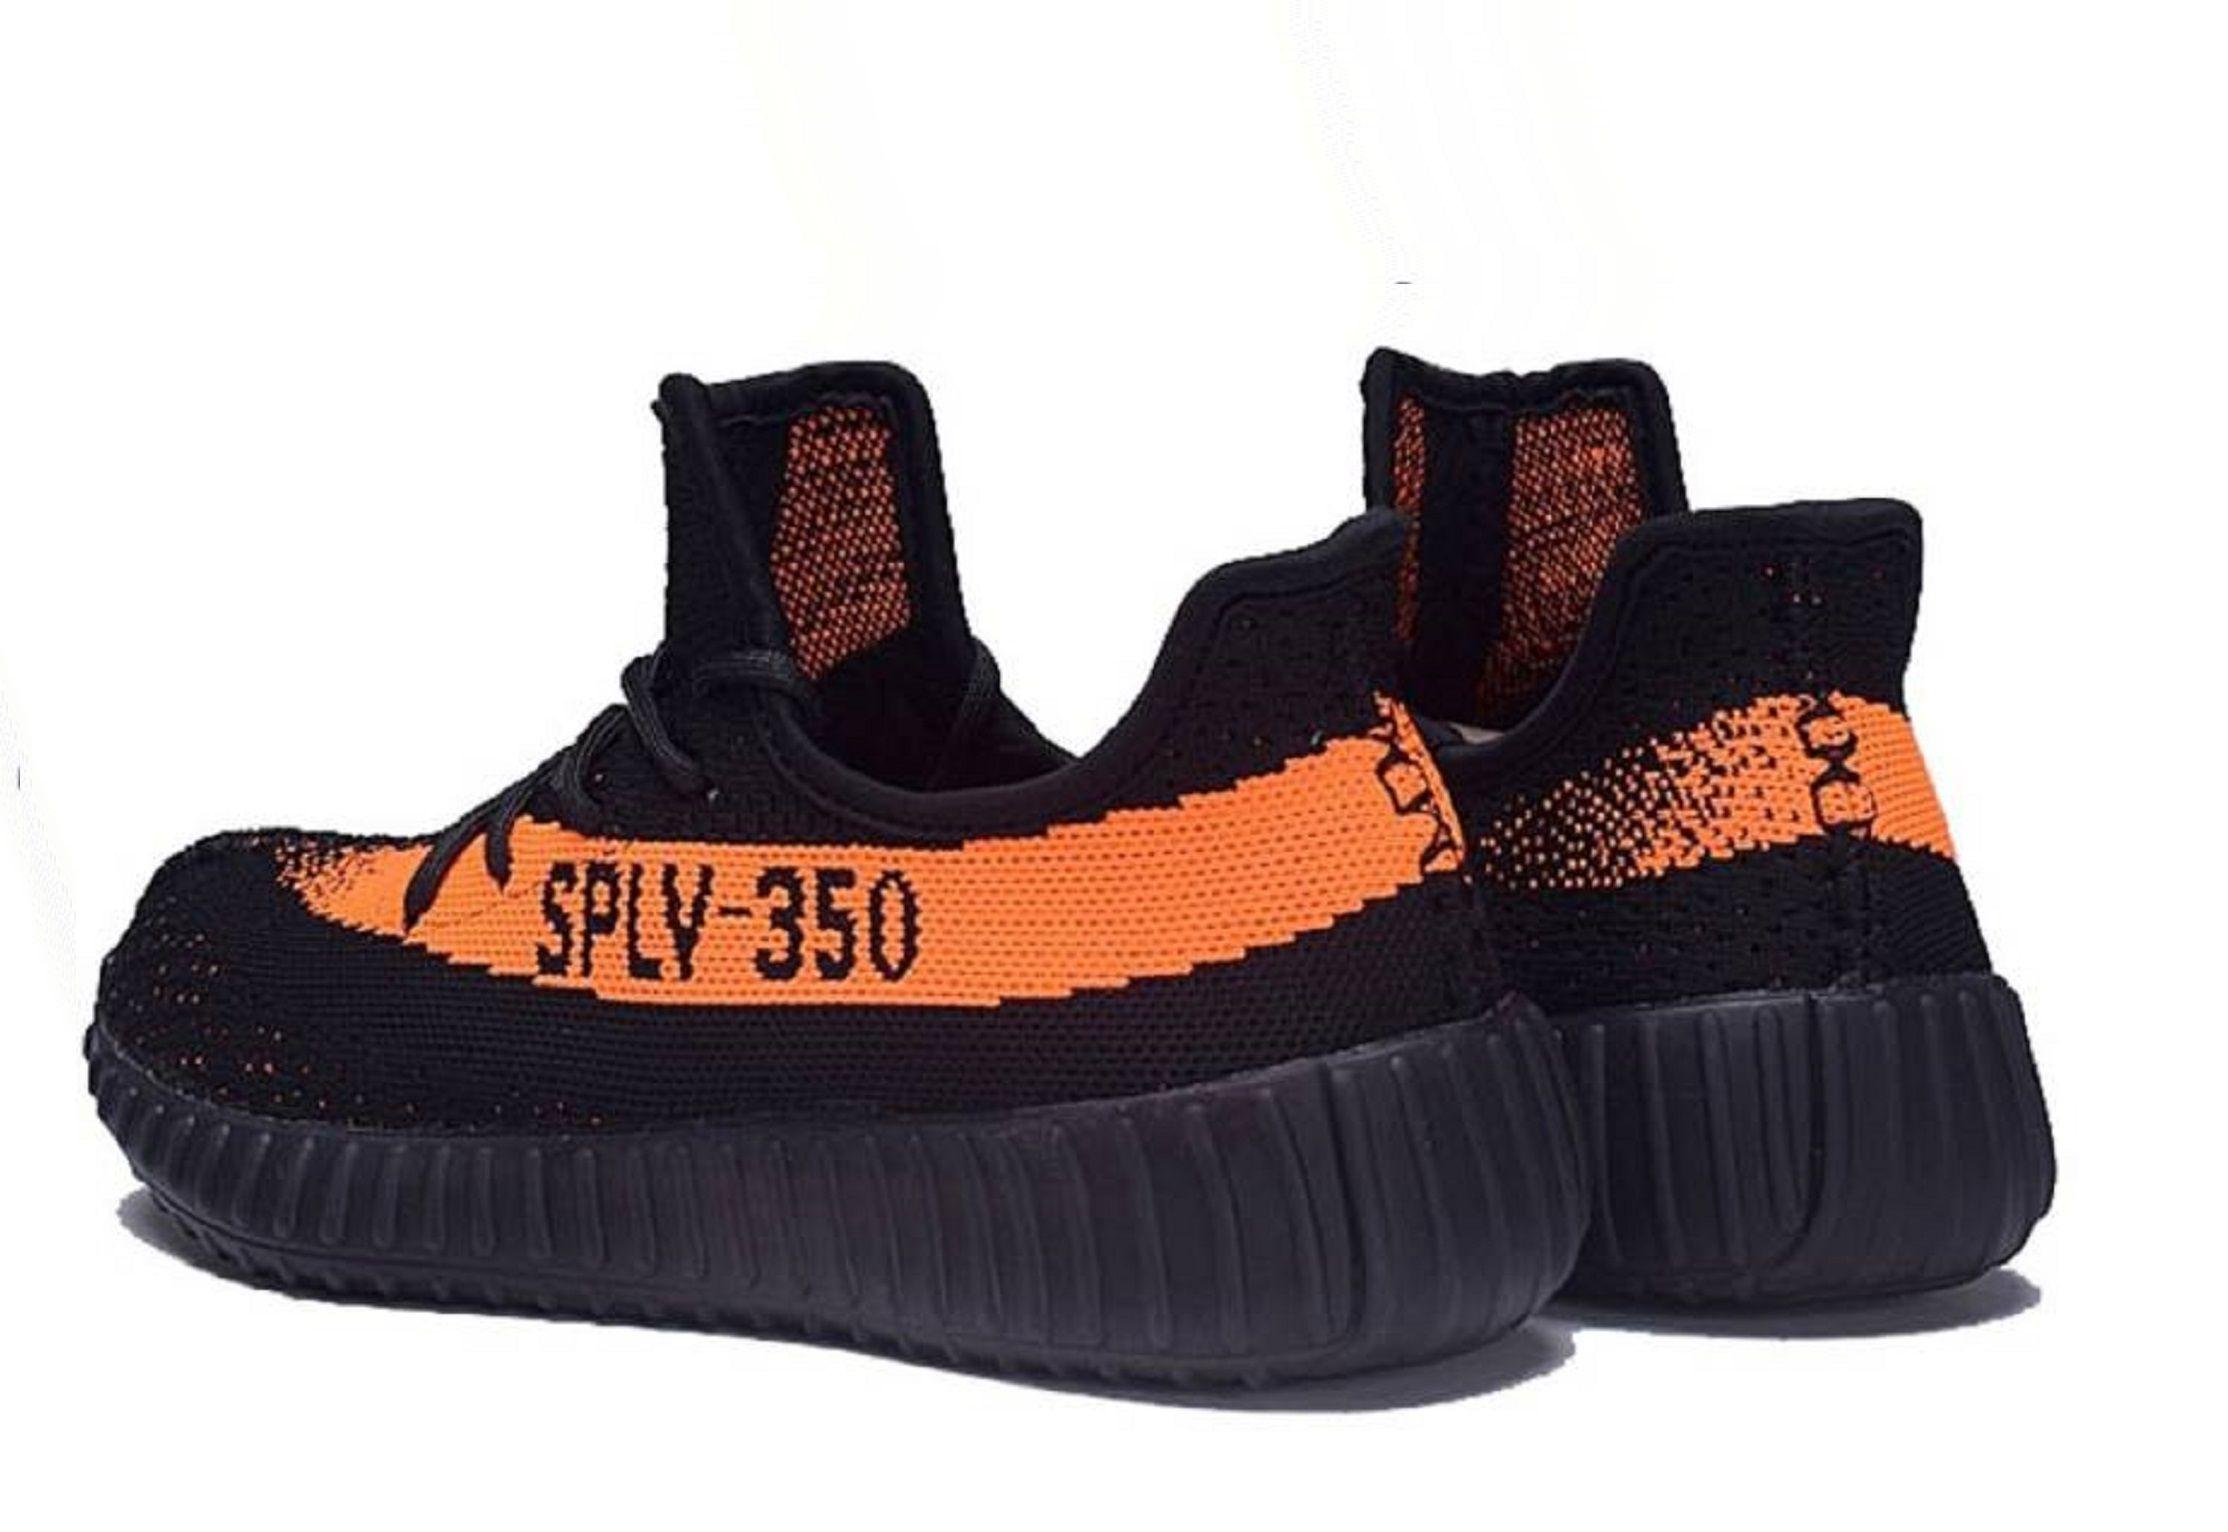 6884c7f1a Adidas Yeezy Boost 350 SPLY V2 Black Orange Running Shoes - Buy ...